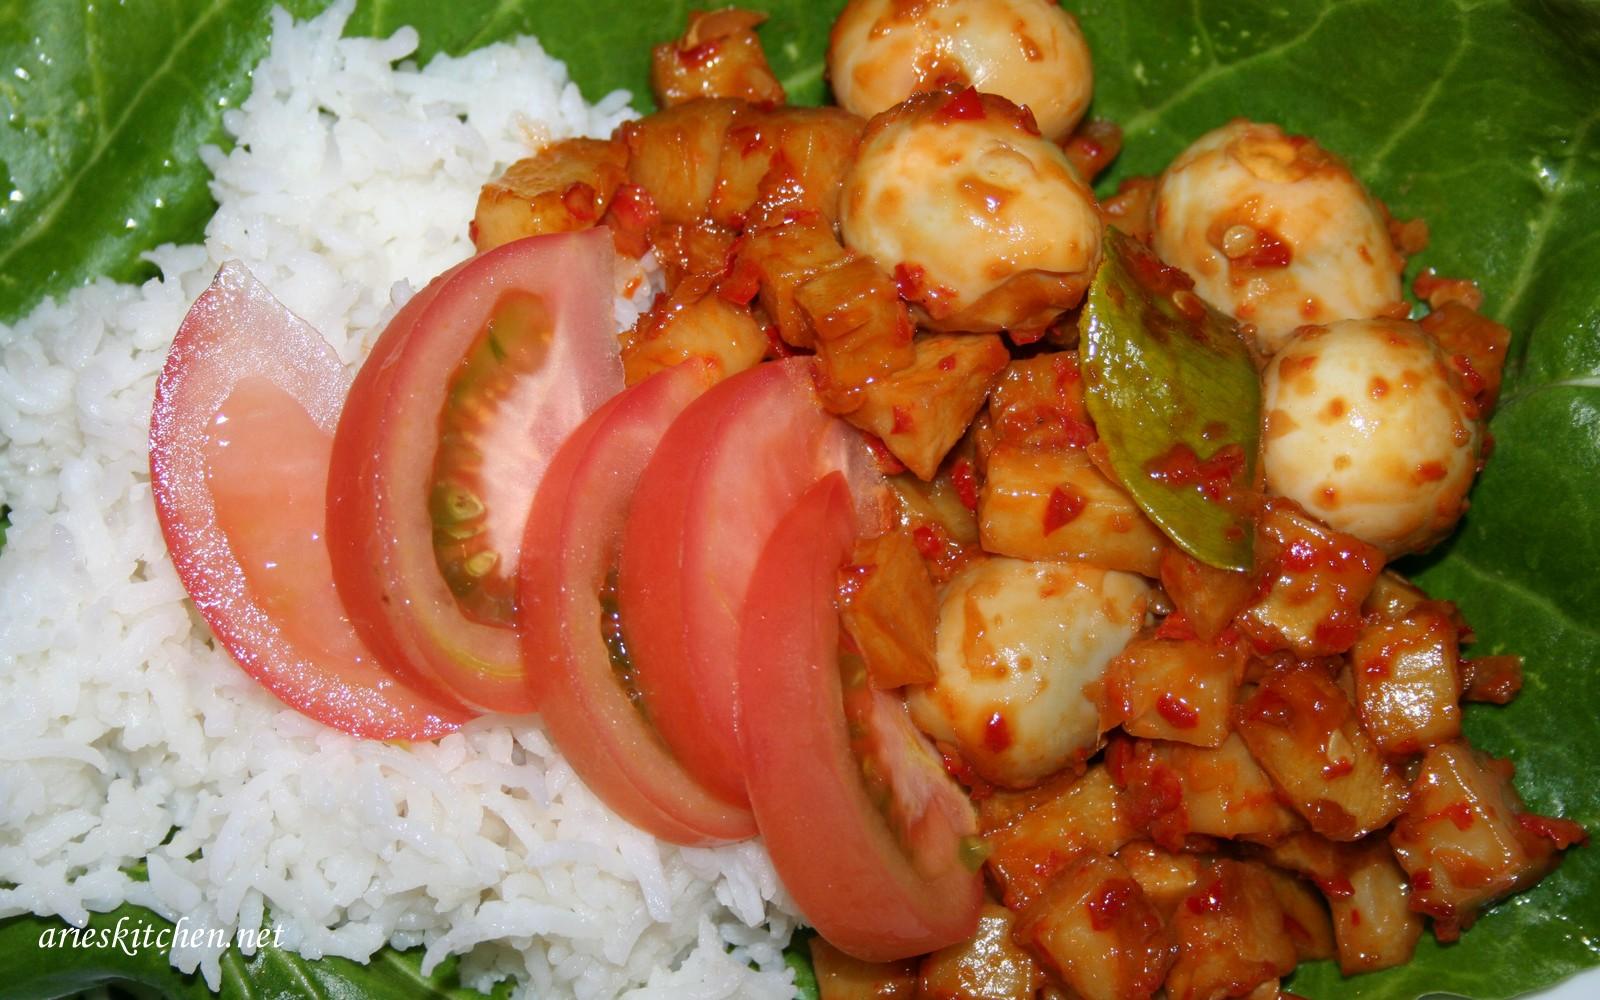 Resep Sambal Goreng Kentang Telur Puyuh Arie S Kitchen